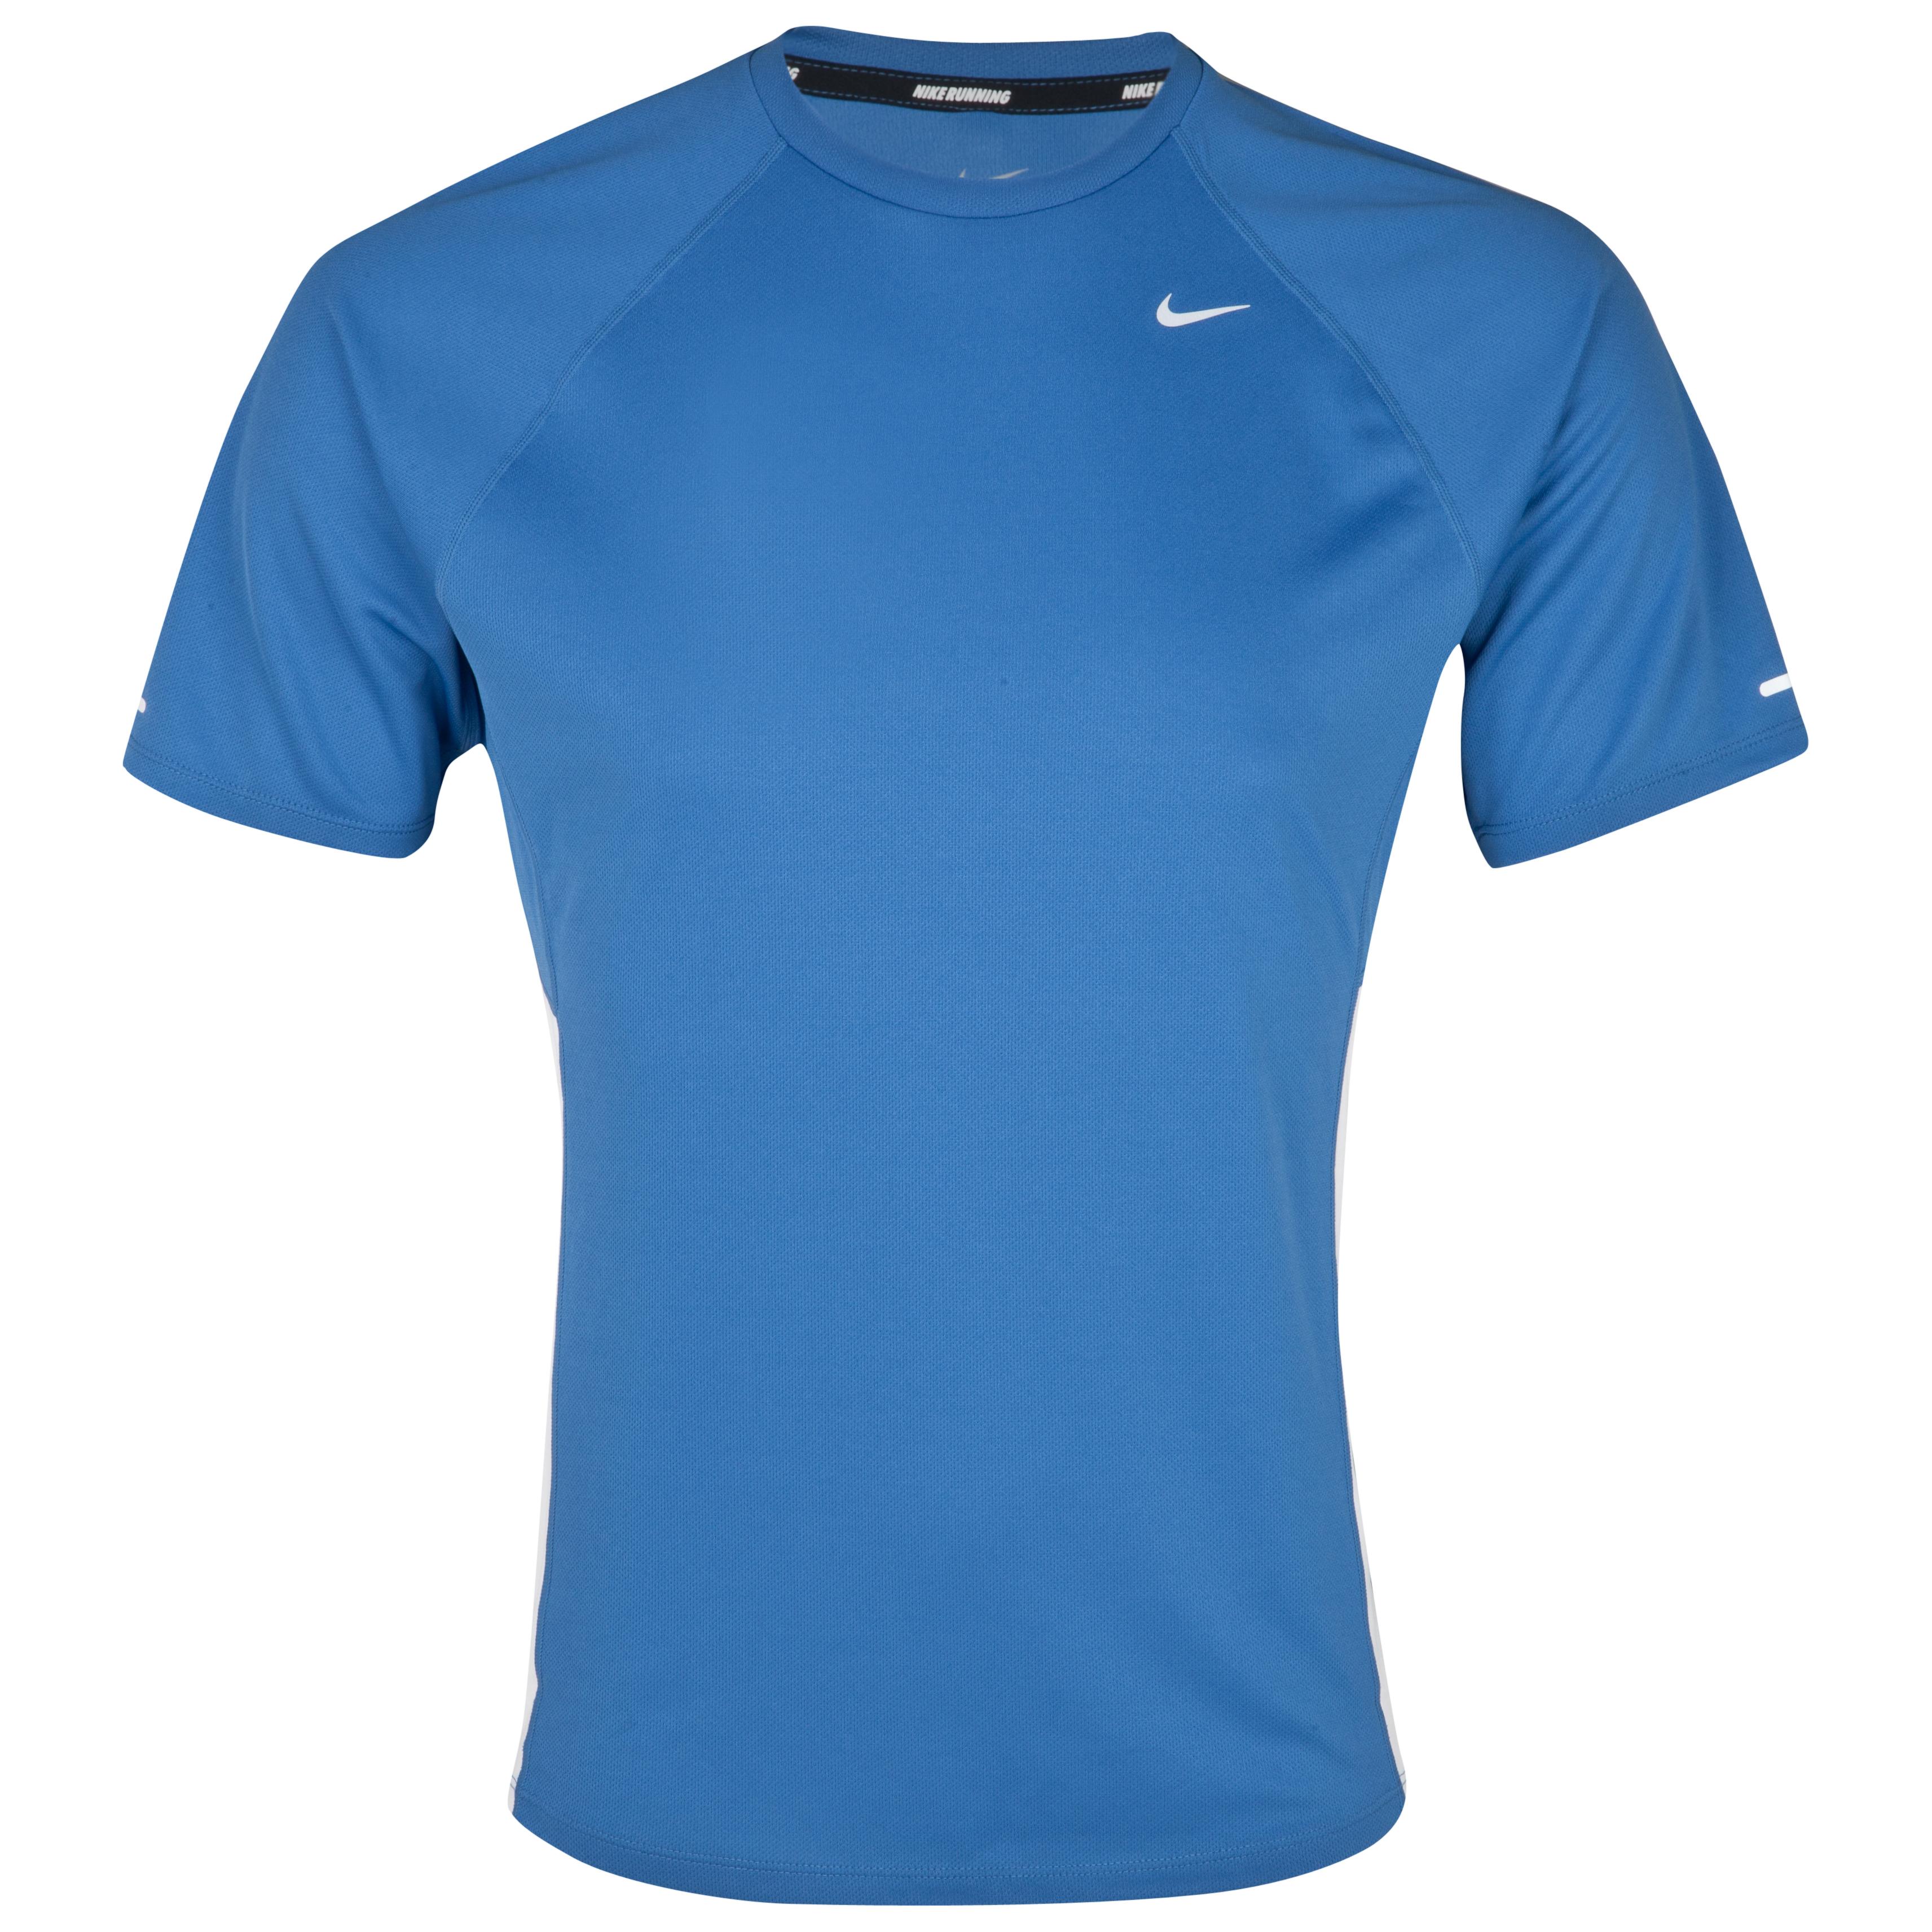 Nike Miler UV Team T-Shirt - Varsity Blue/White/Reflective Silver